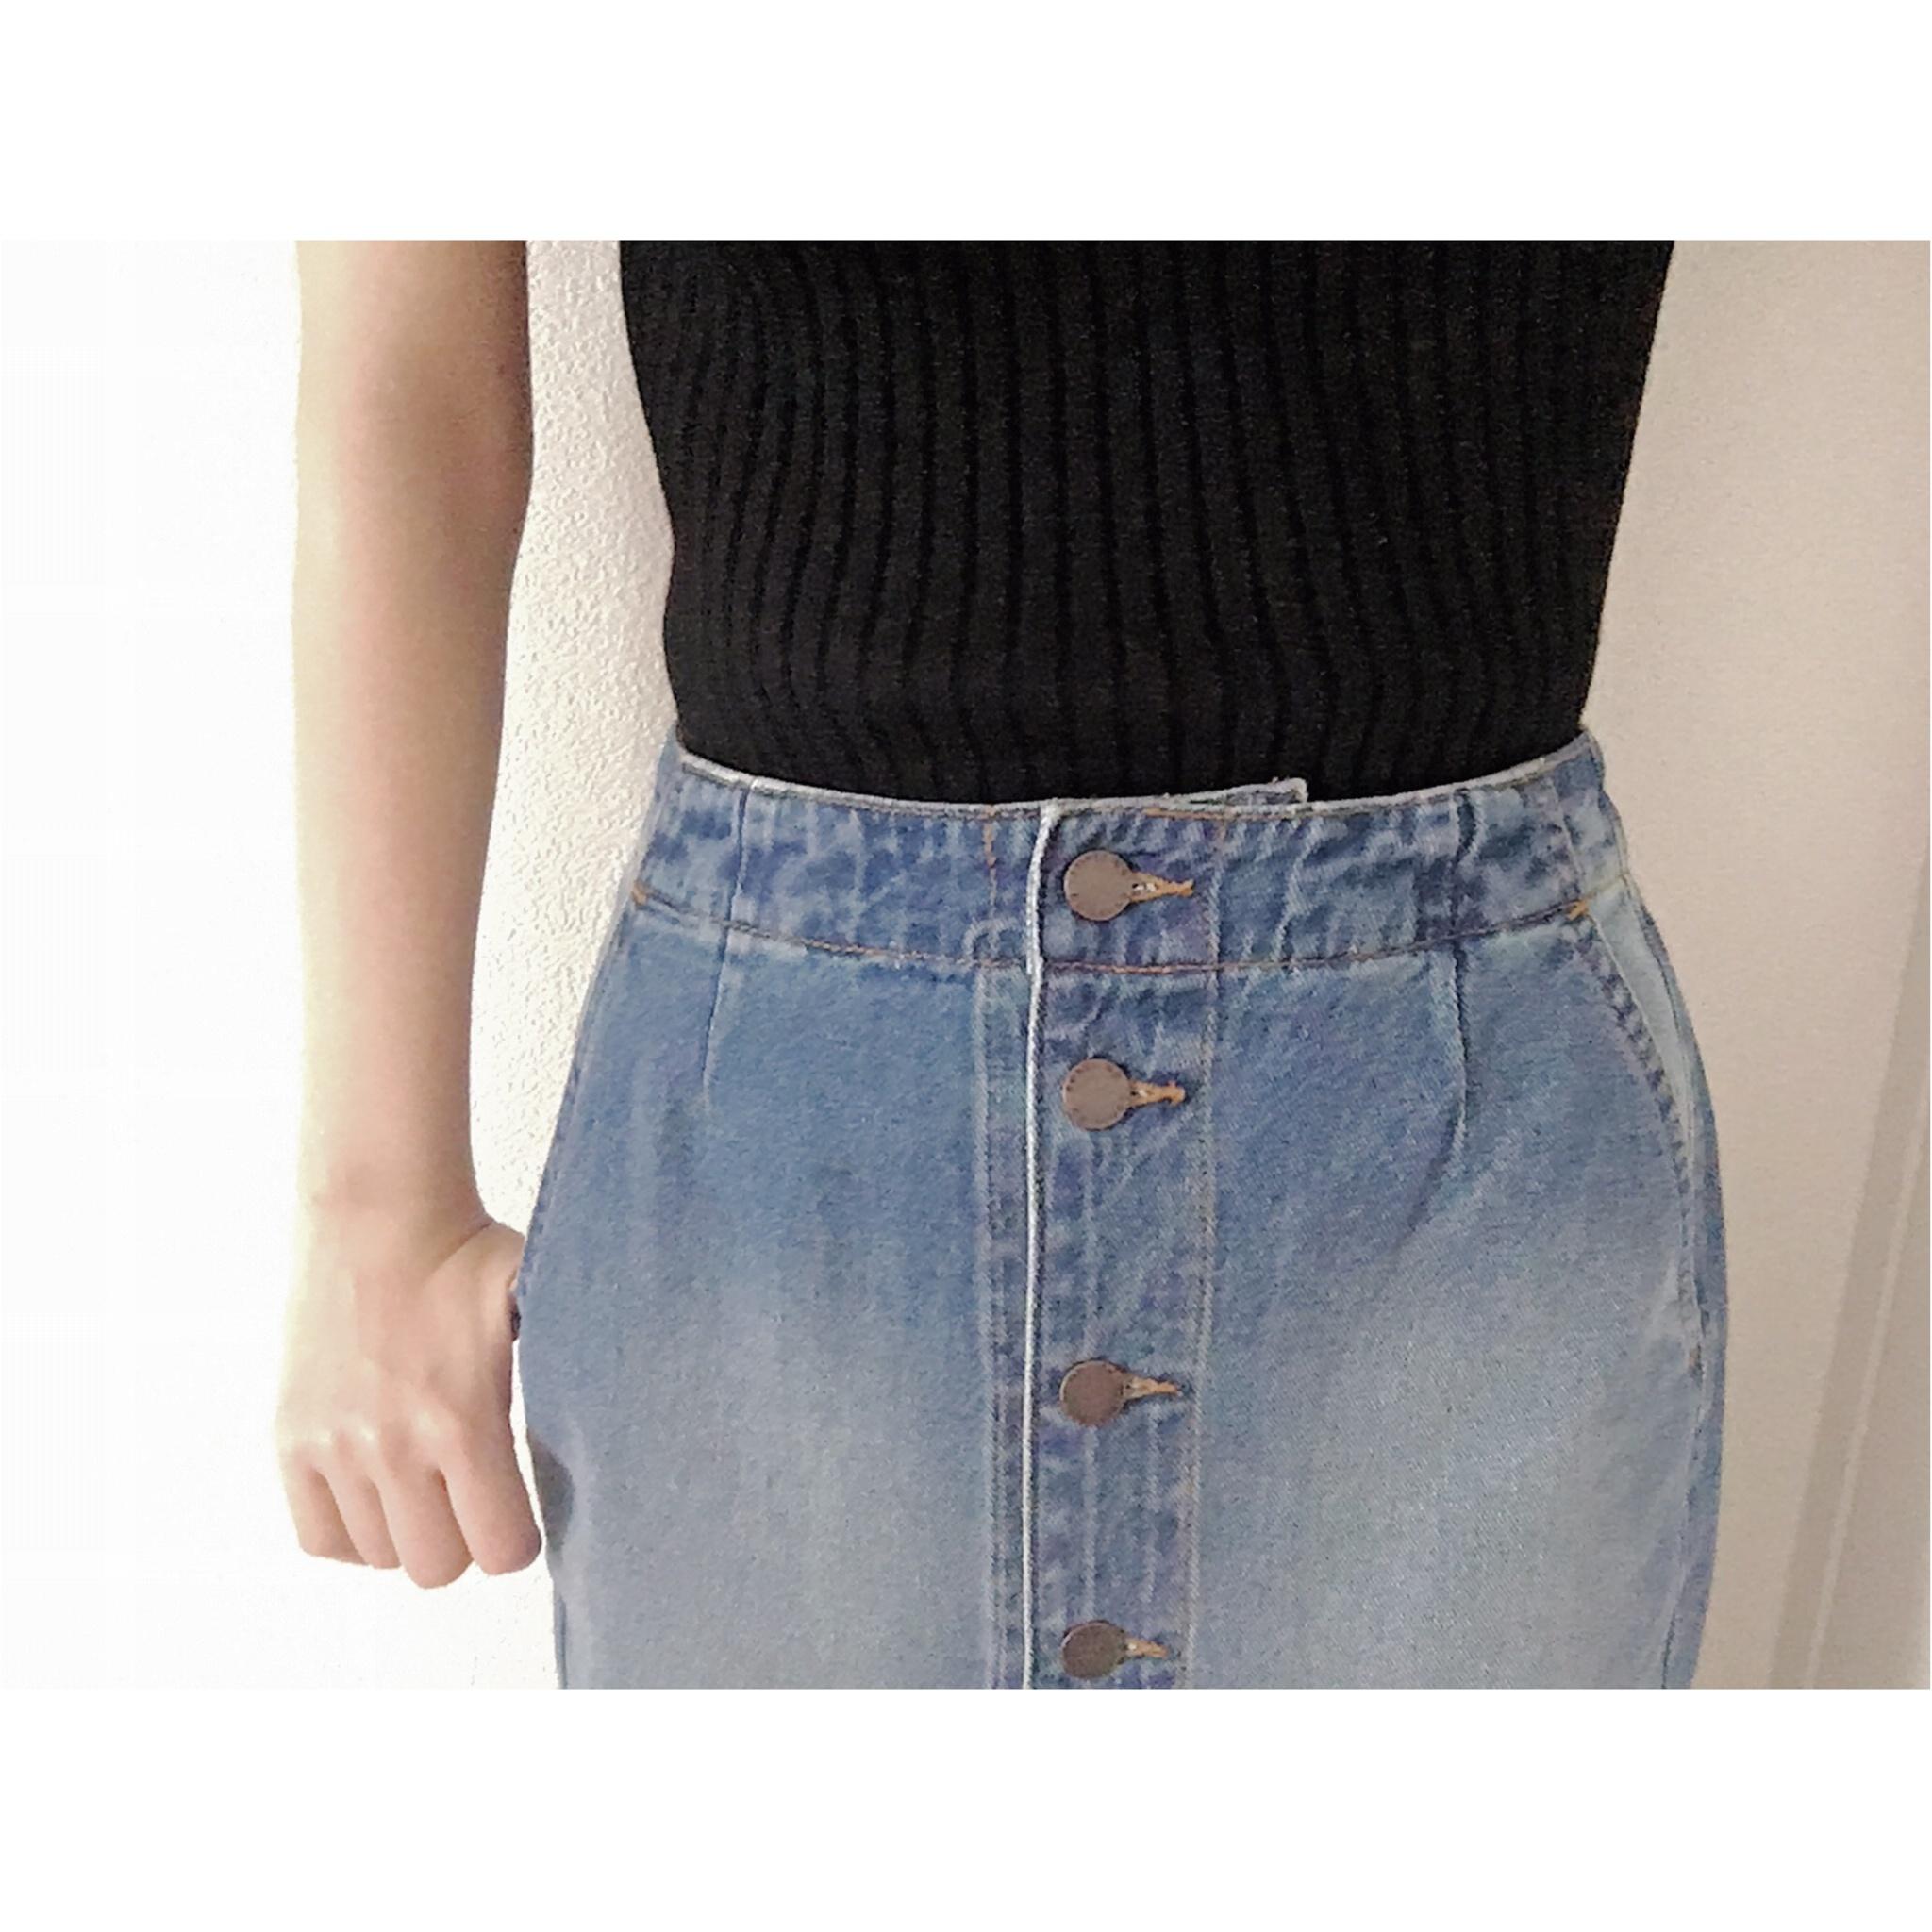 ★《GU》のミディスカートで、high & lowファッション☺︎_2